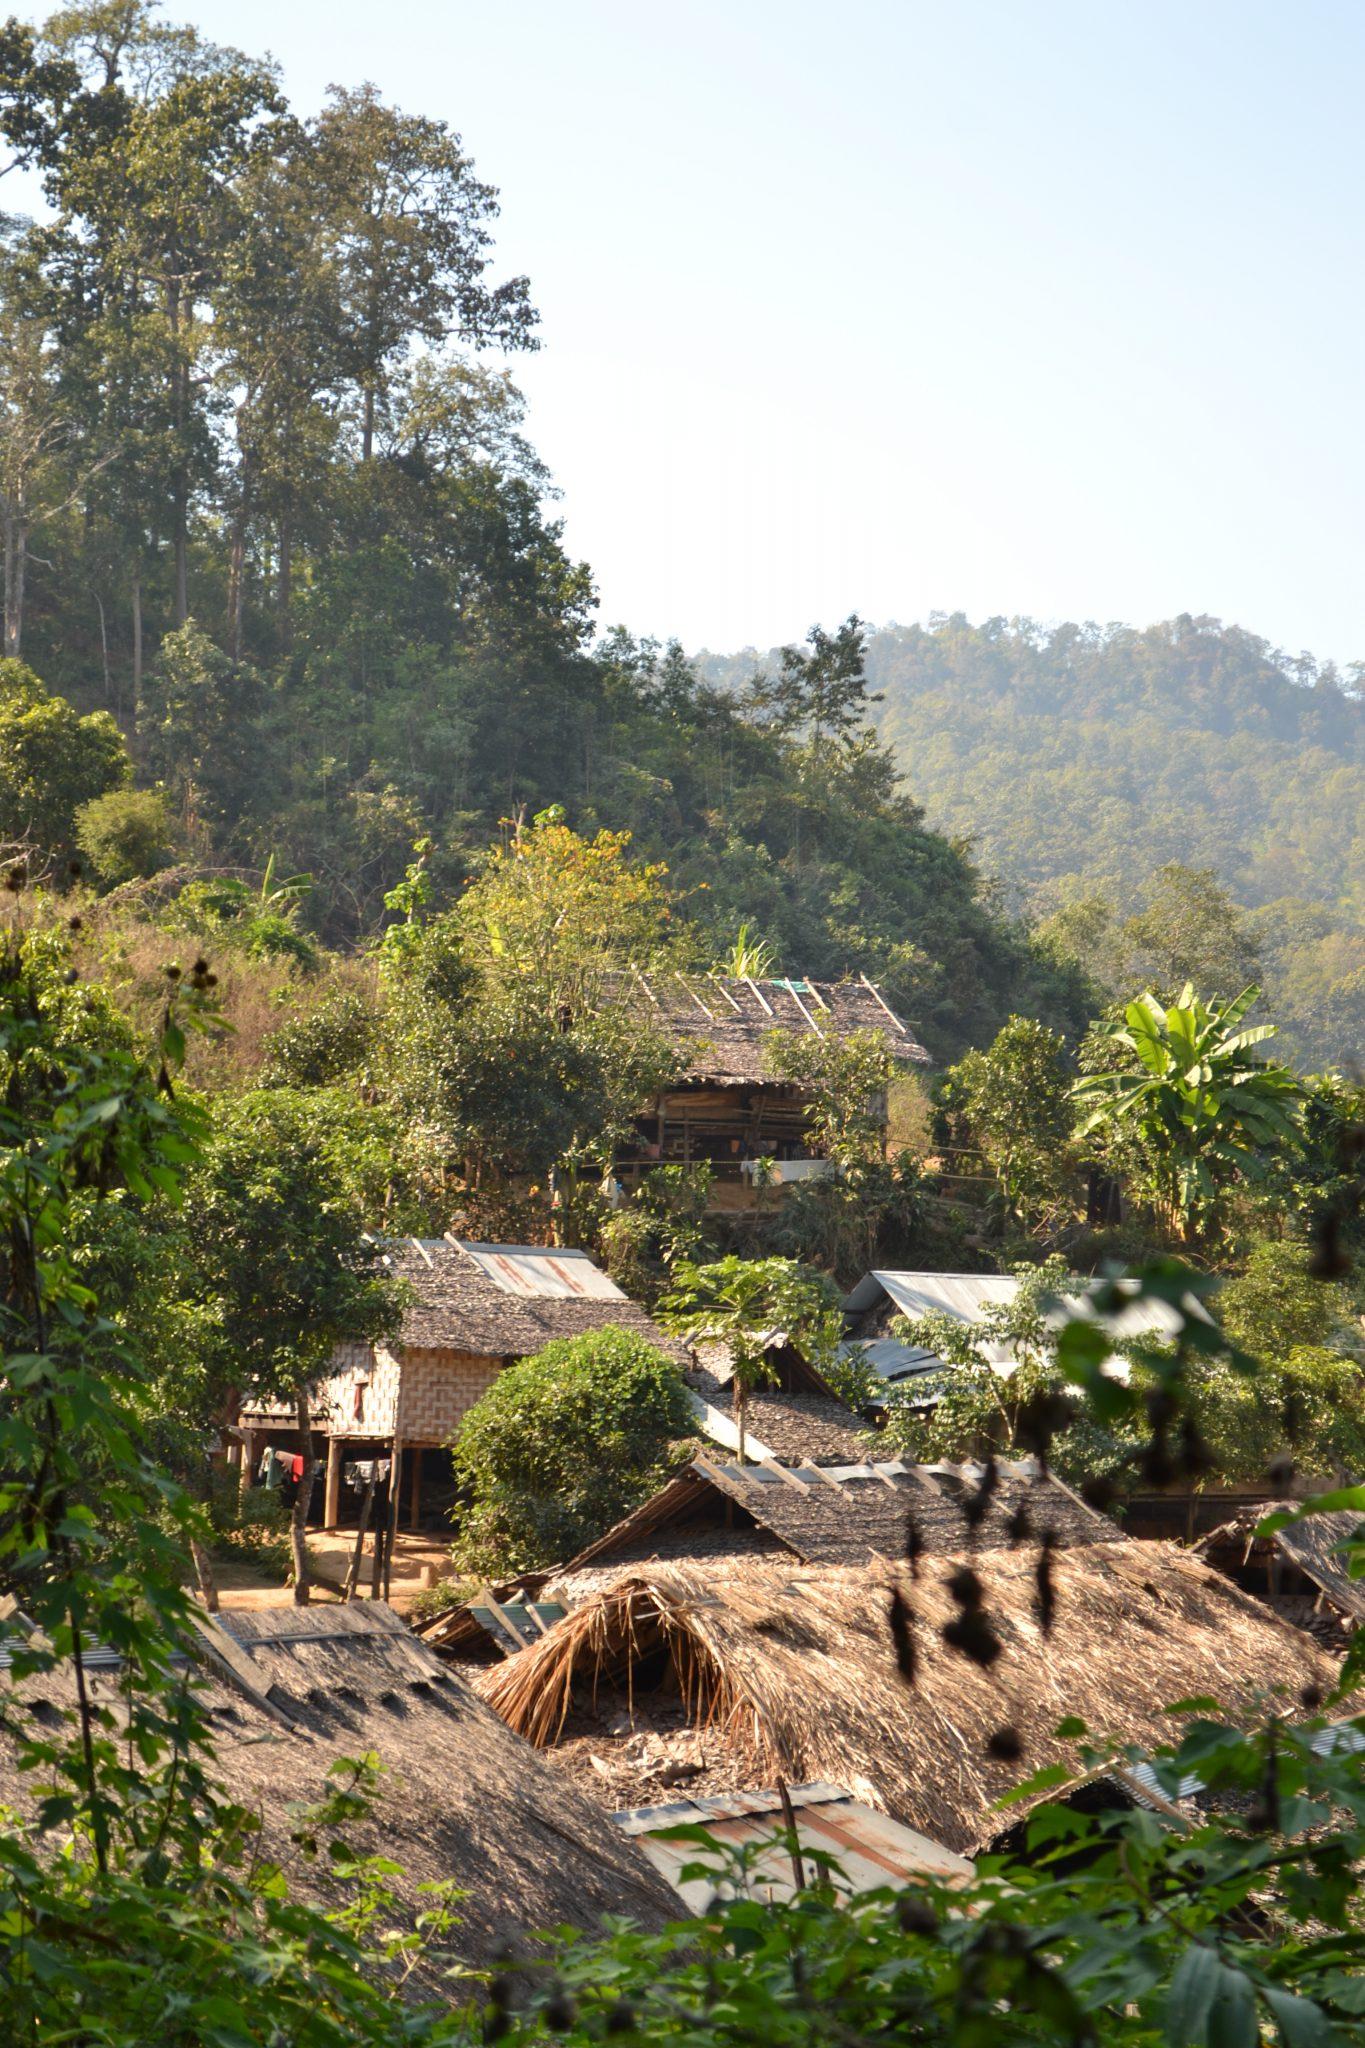 Huay Sua Thao. Photo by: Joney Habraken